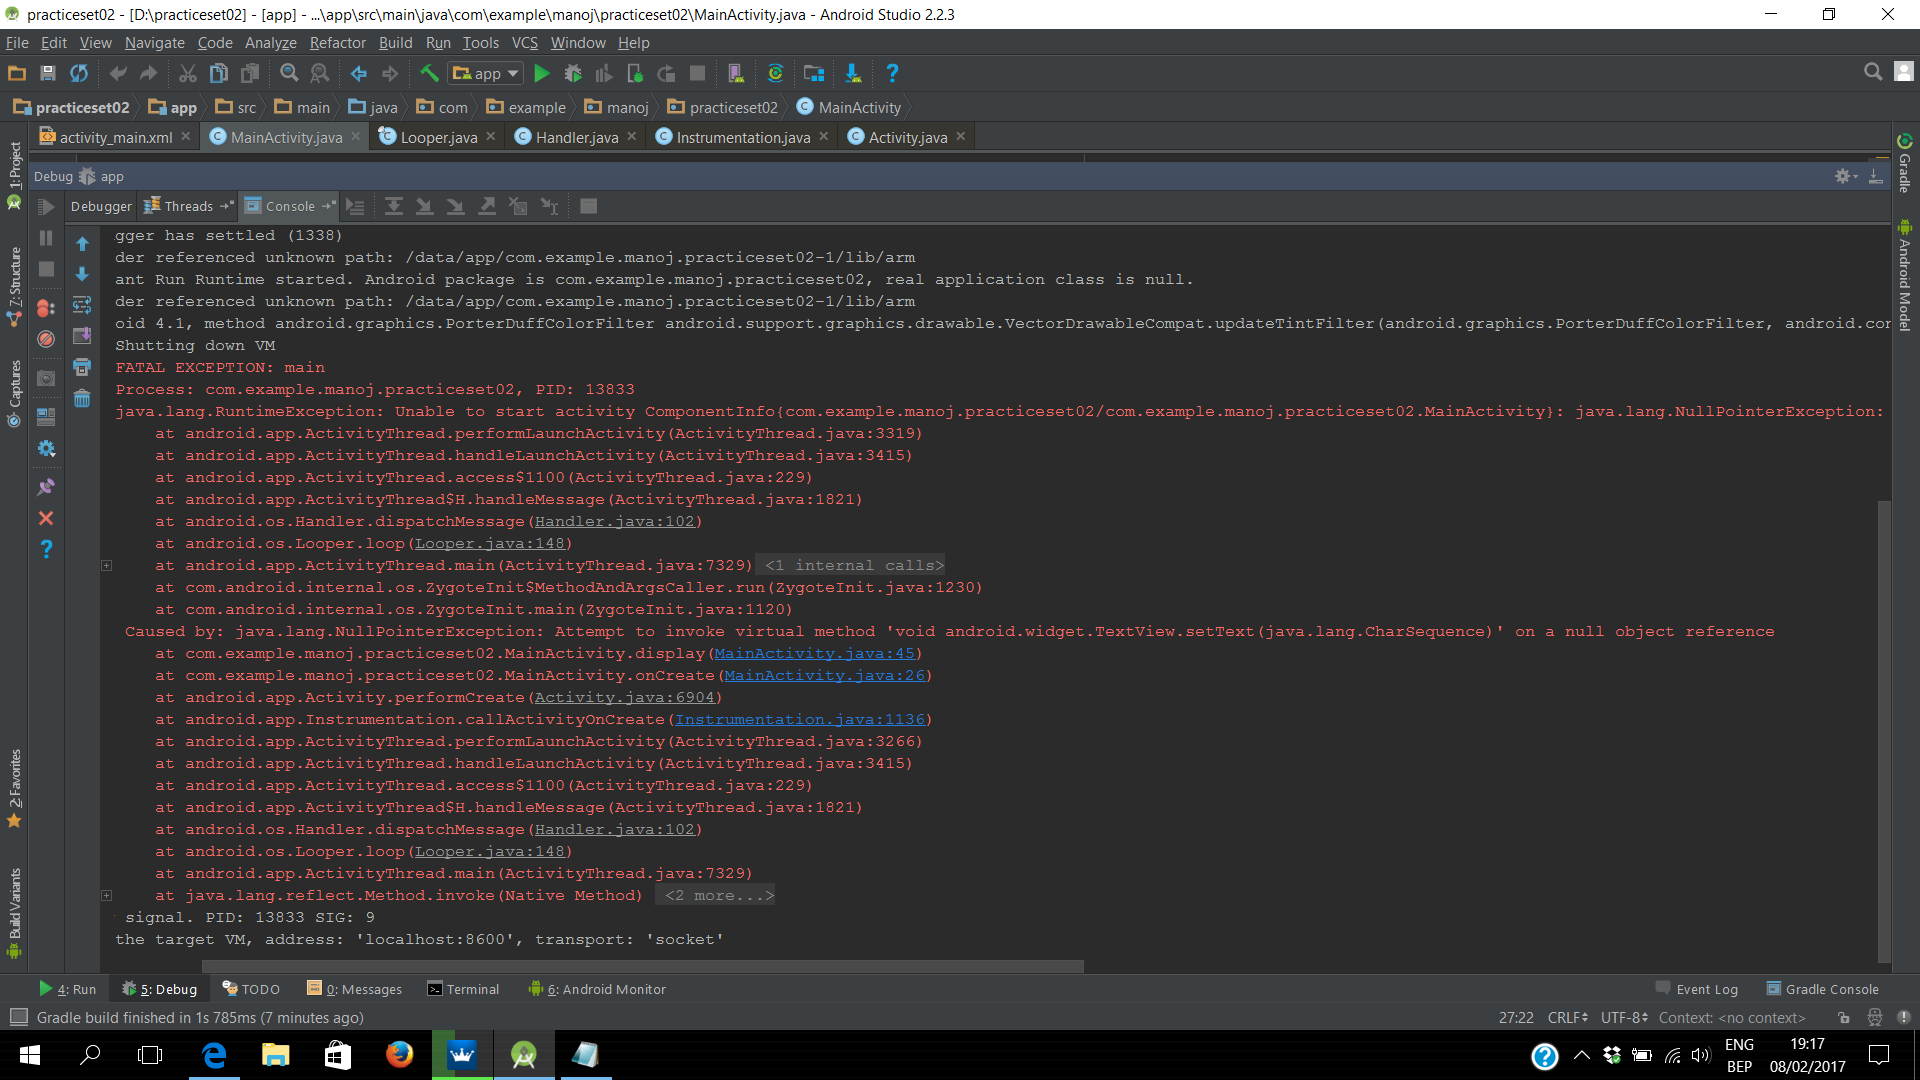 screenshot 2017-02-08 19 17 12